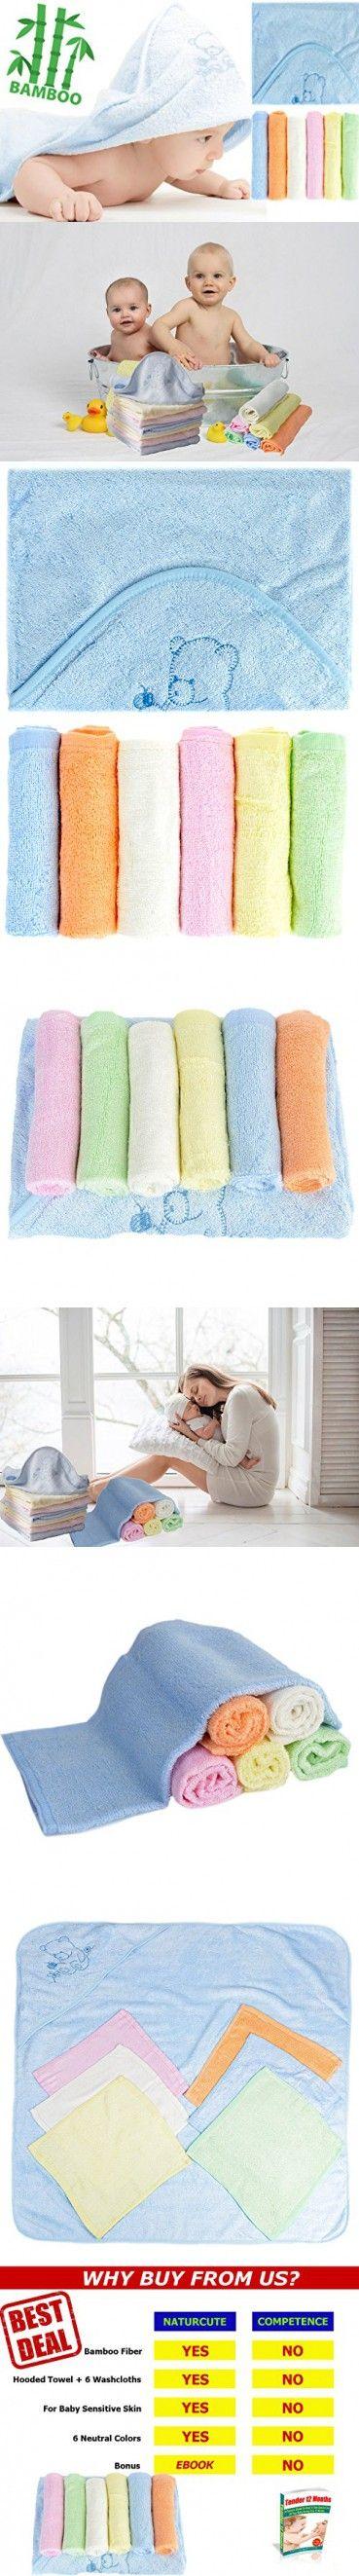 NaturCute Bamboo Baby Hooded Towel and 6 Washcloths Set - Blue